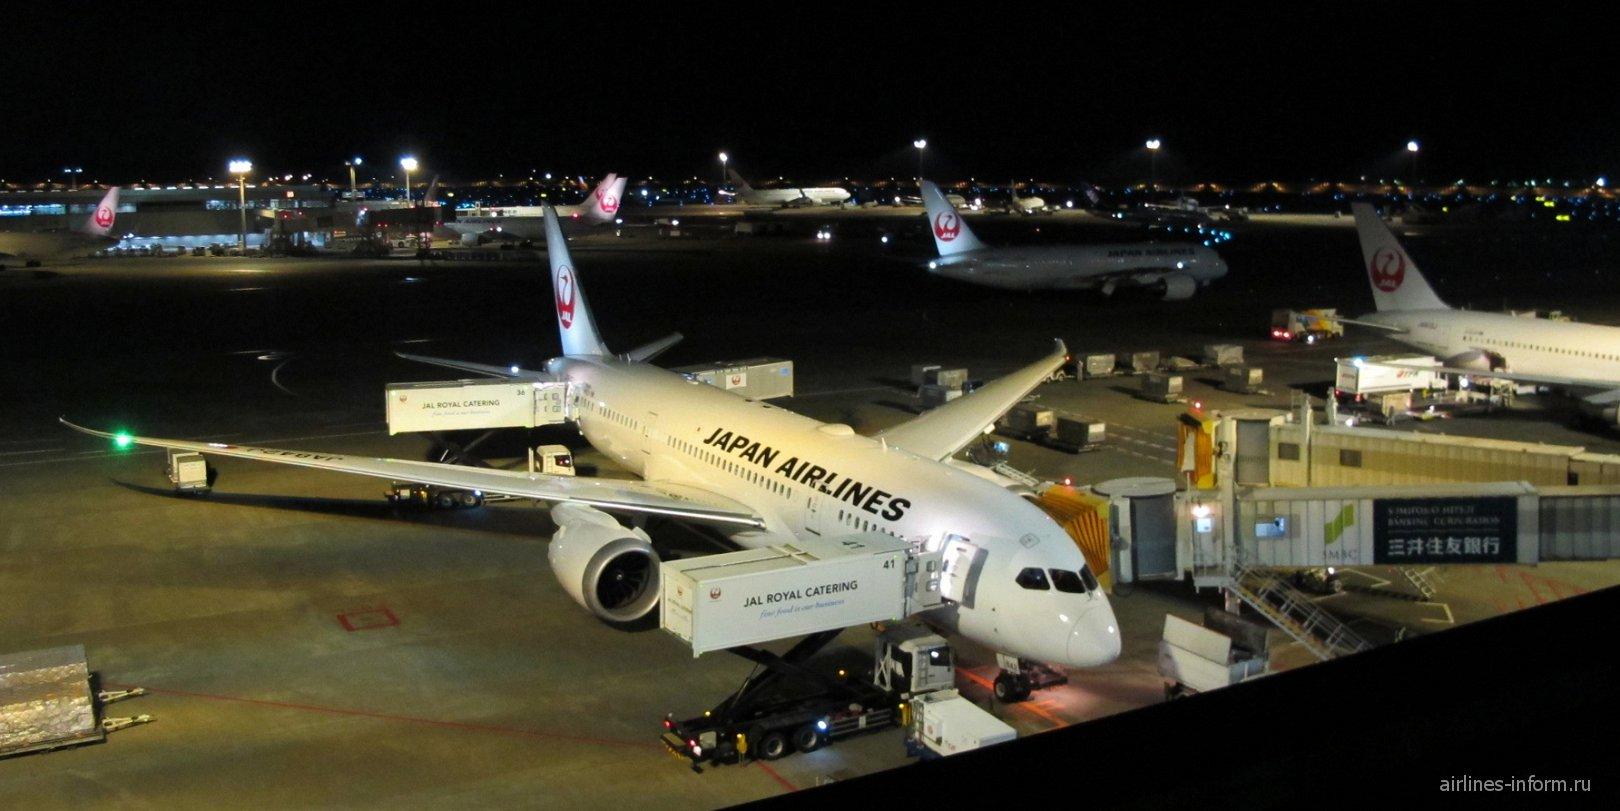 Боинг-787-8 Японских авиалиний в аэропорту Токио Нарита